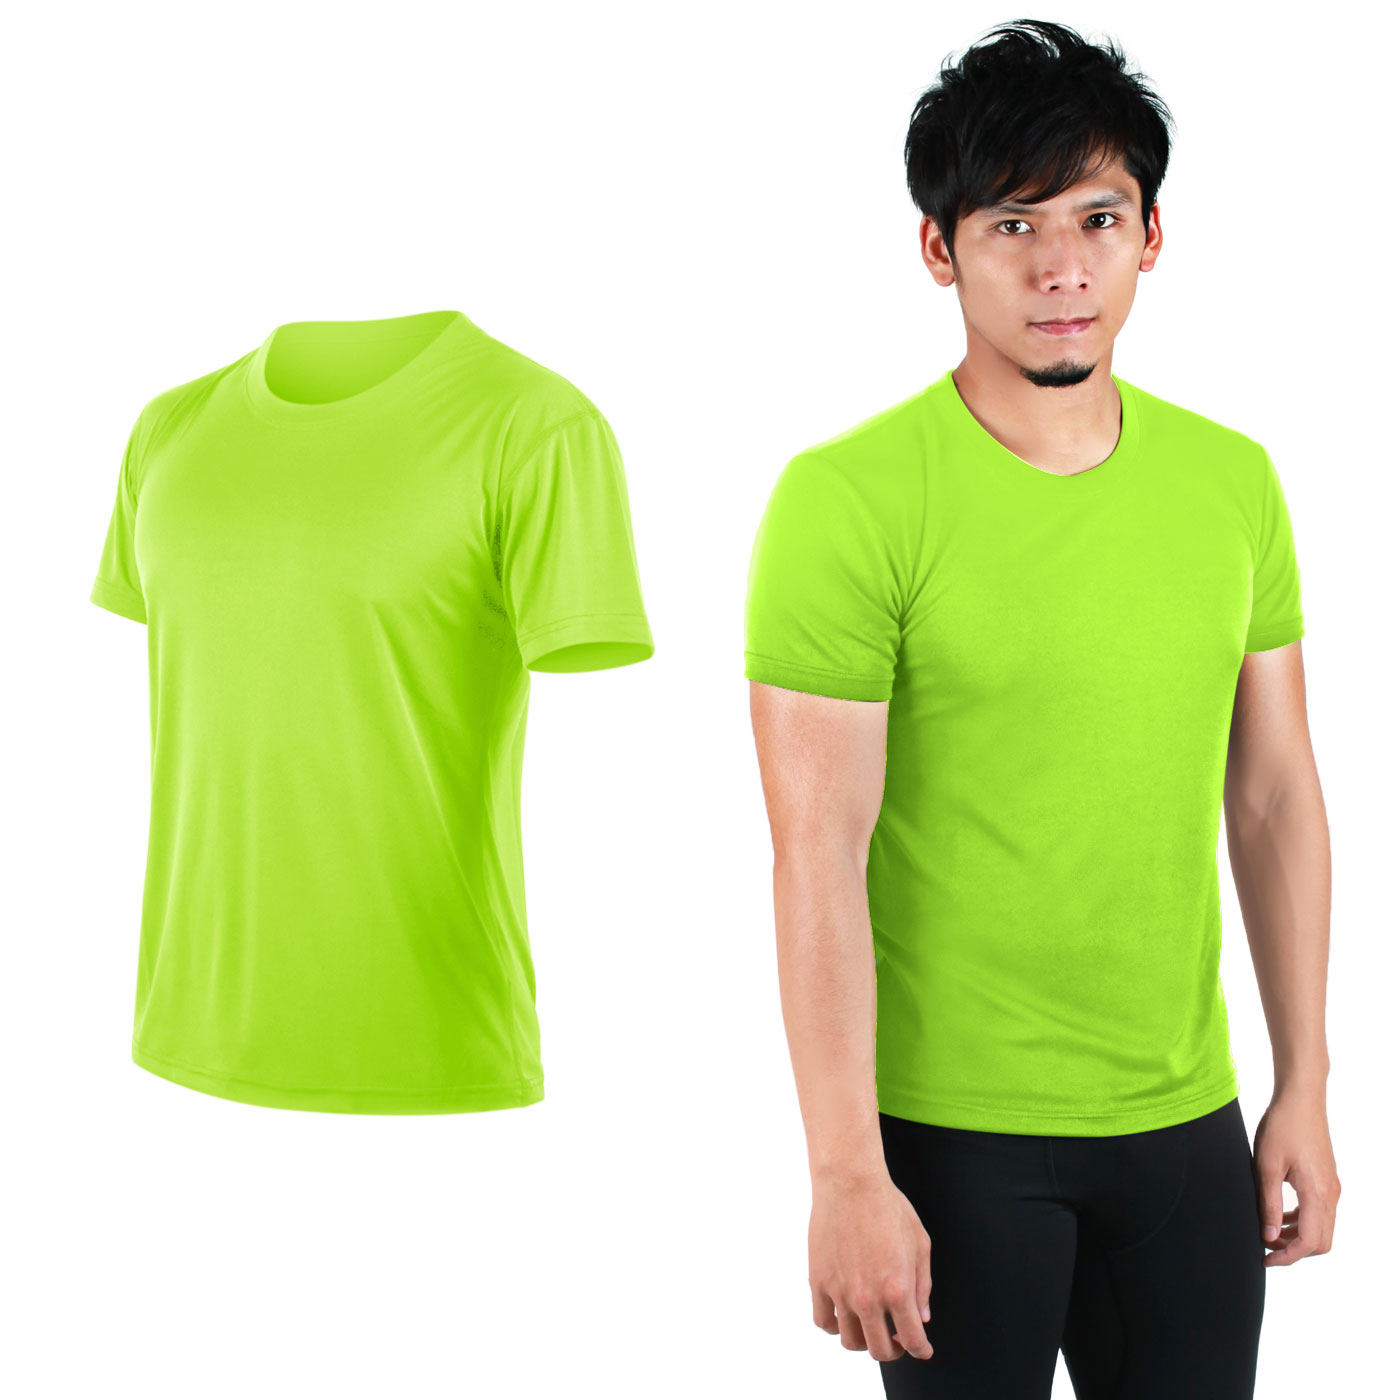 HODARLA FLARE 100 吸濕排汗衫3108301 - 果綠